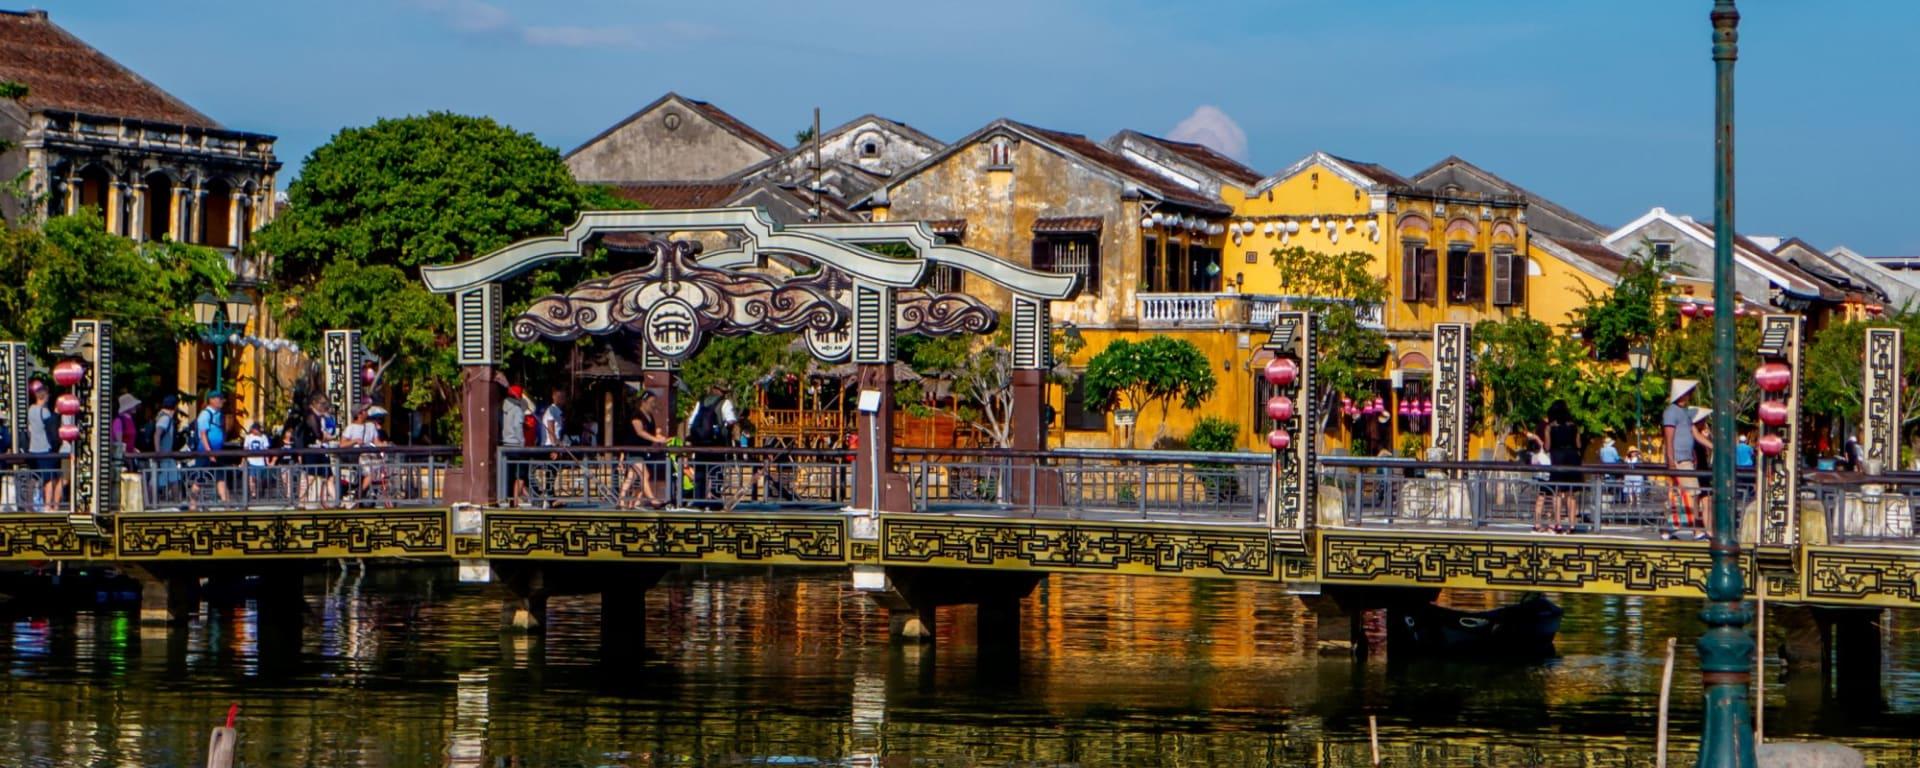 Grand voyage en Indochine de Hanoi: Hoi An Town Scene